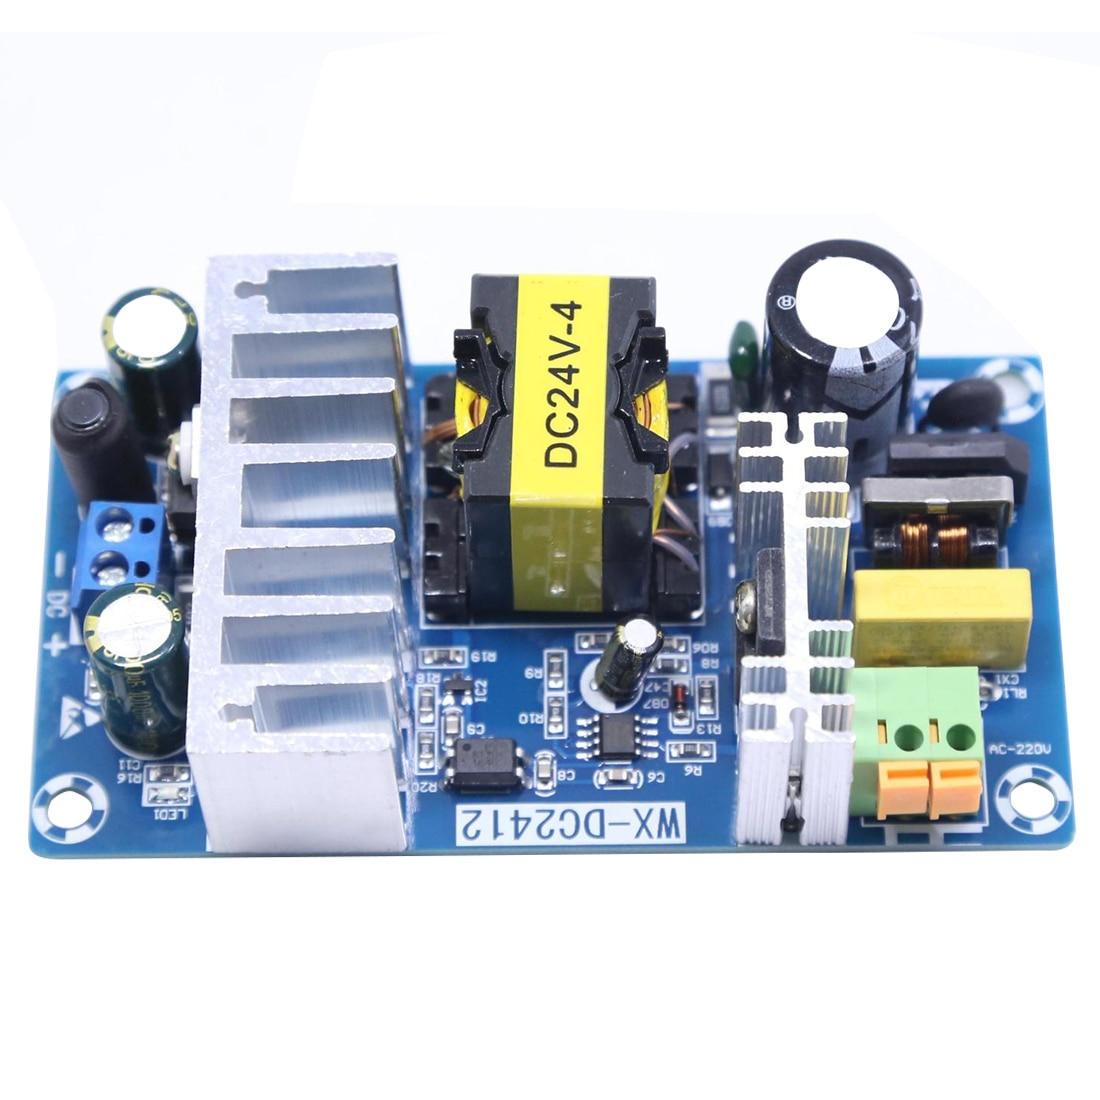 DIY Electronic Speaker Plasma Speaker Classic Tl494 Plasma Sound - A Full Set Of Parts